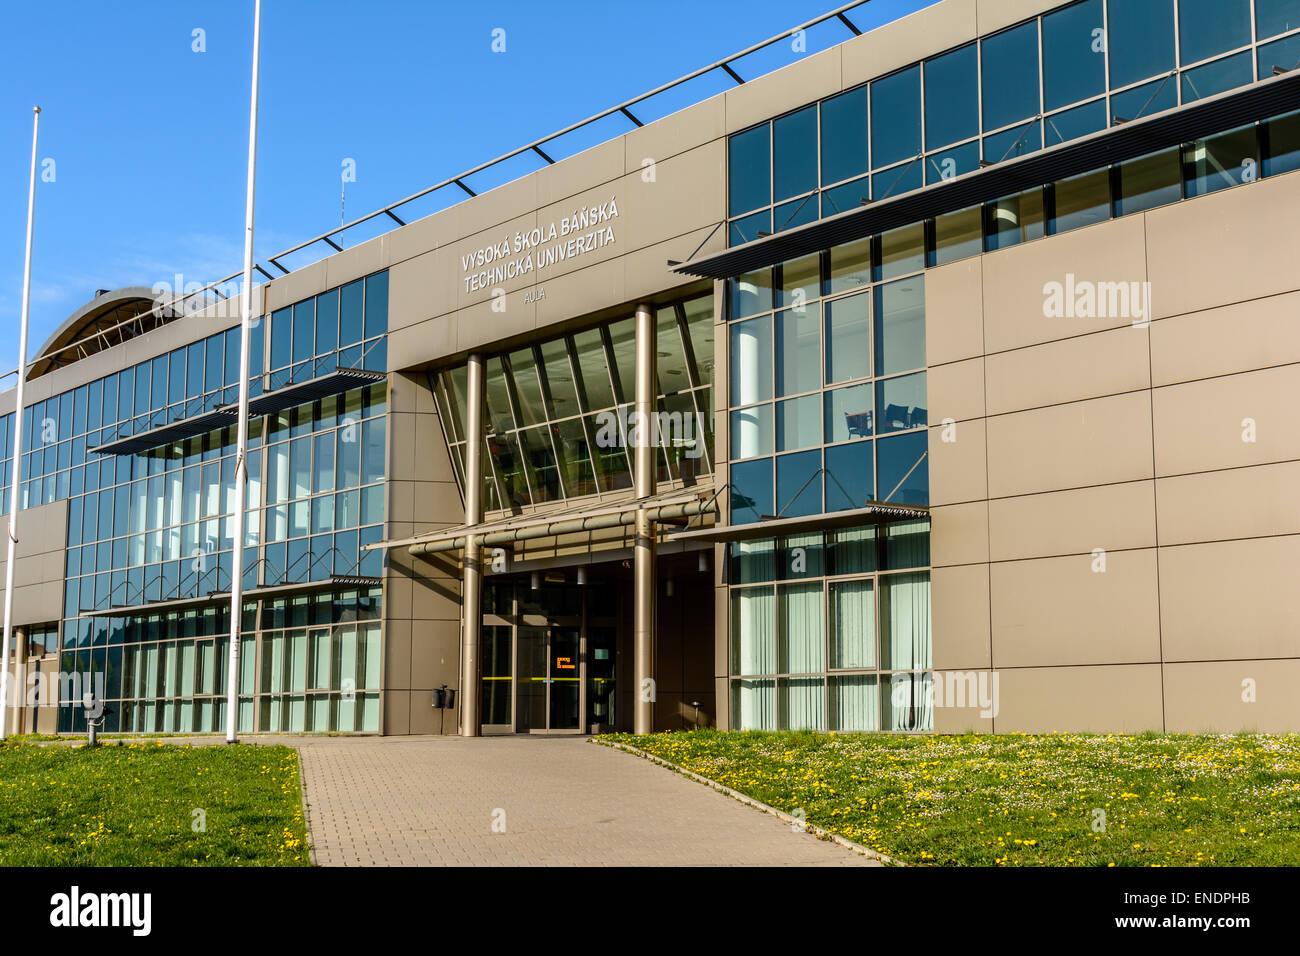 Building of Technical University of Ostrava Czech republic - Stock Image